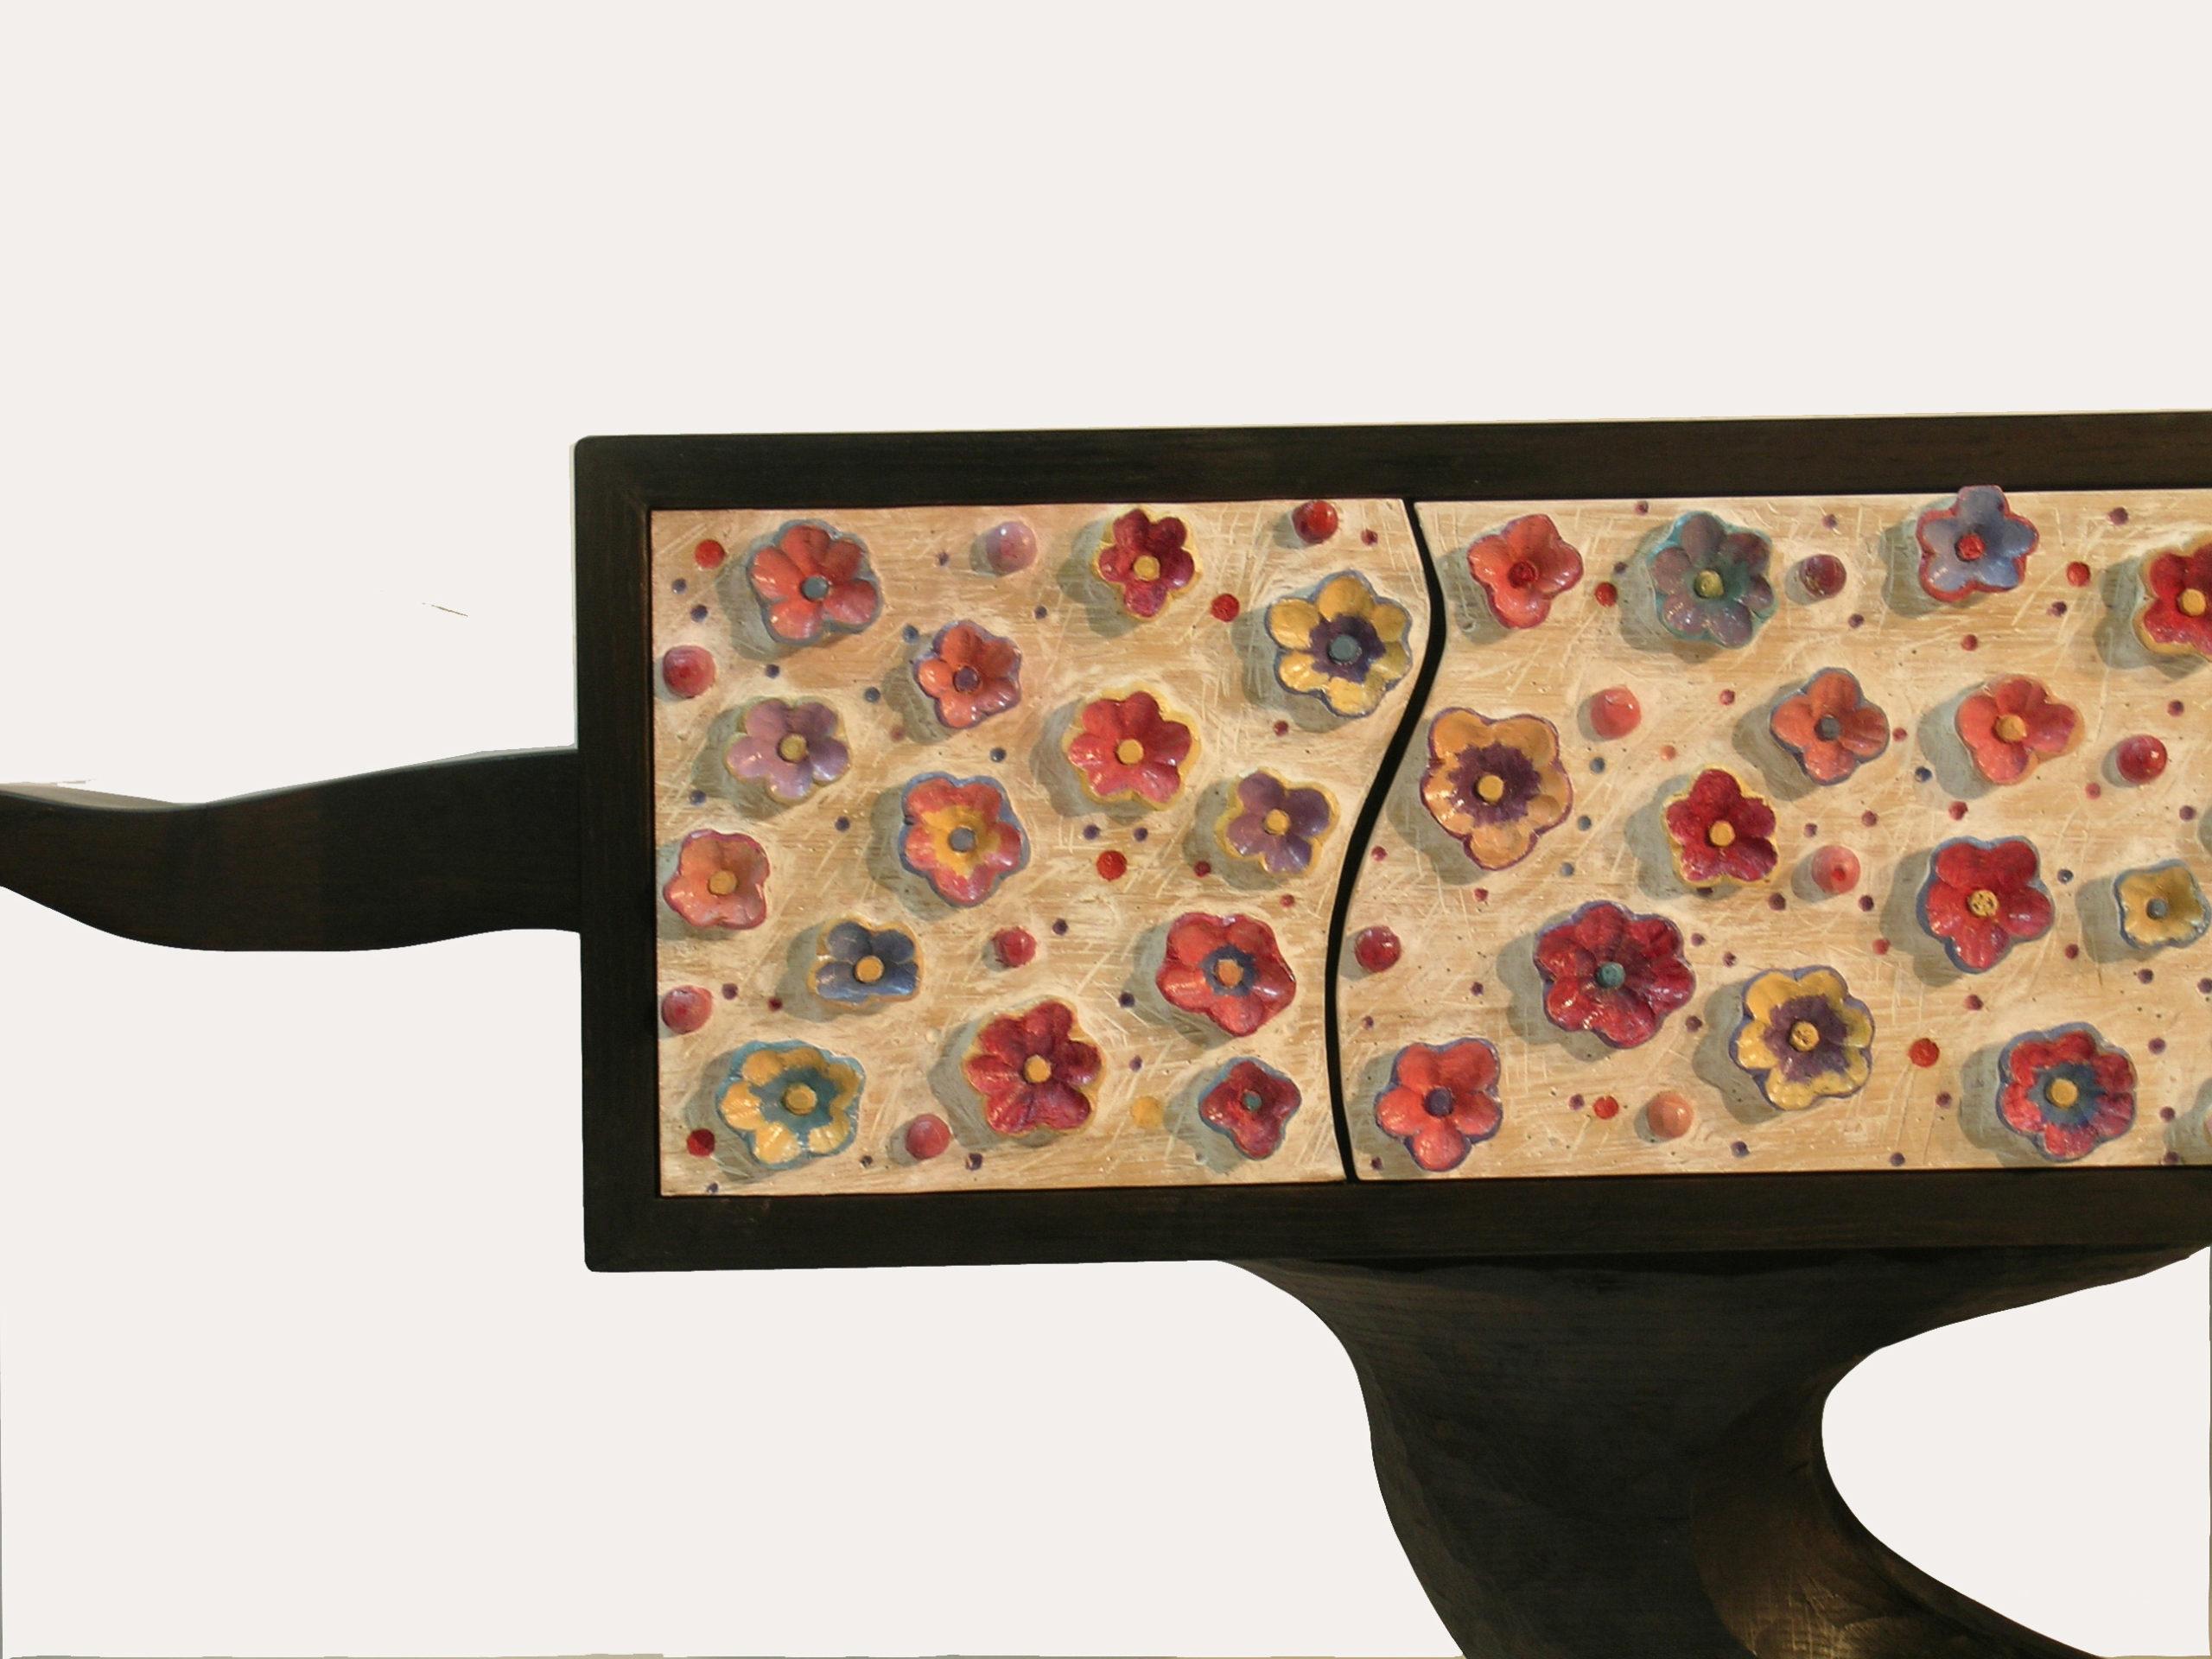 Chêne teinté et peint, 108 x 182 x 42 cm.